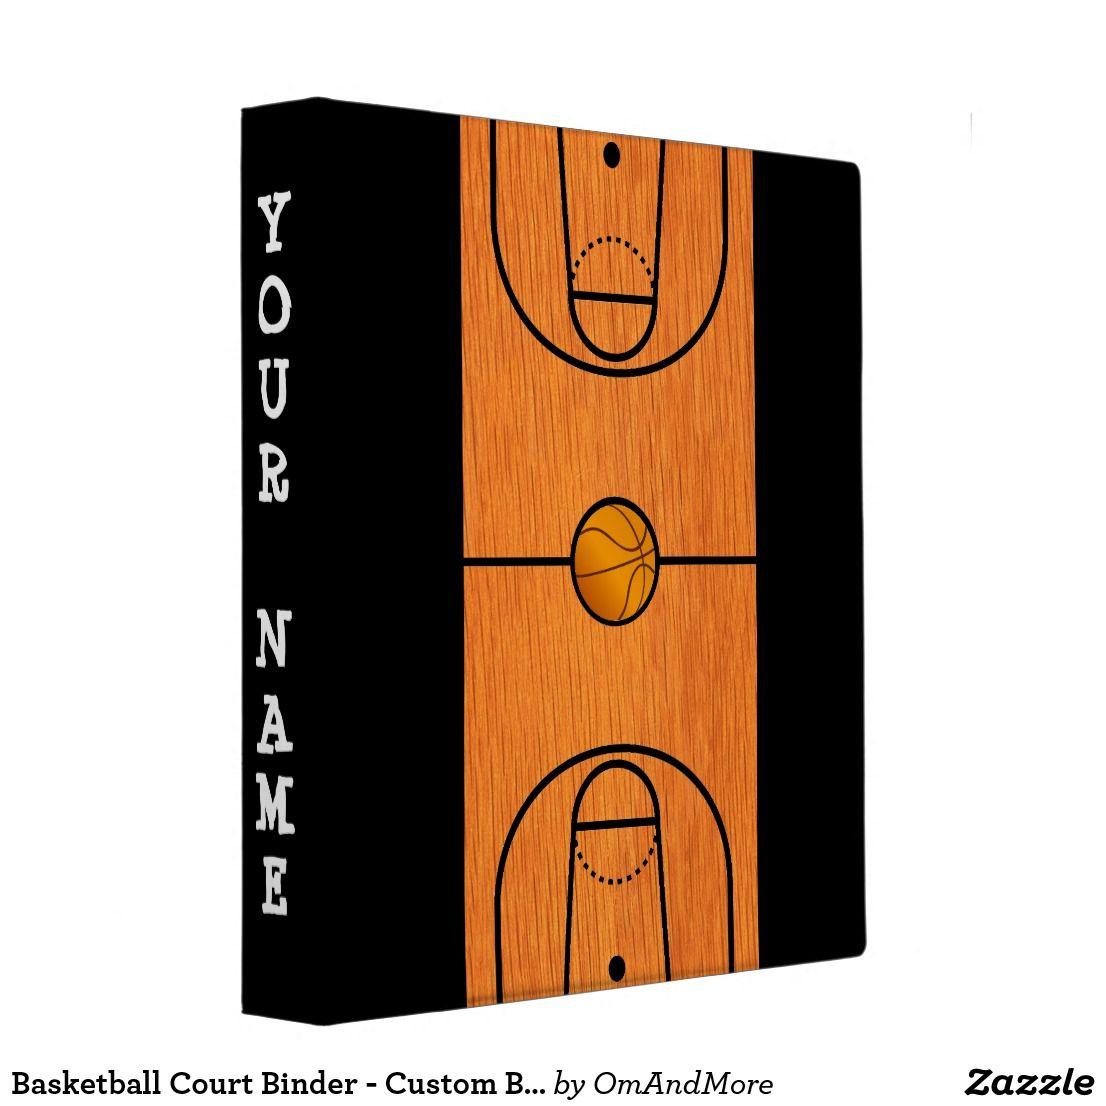 Basketball Court Binder - Custom Basketball Gifts